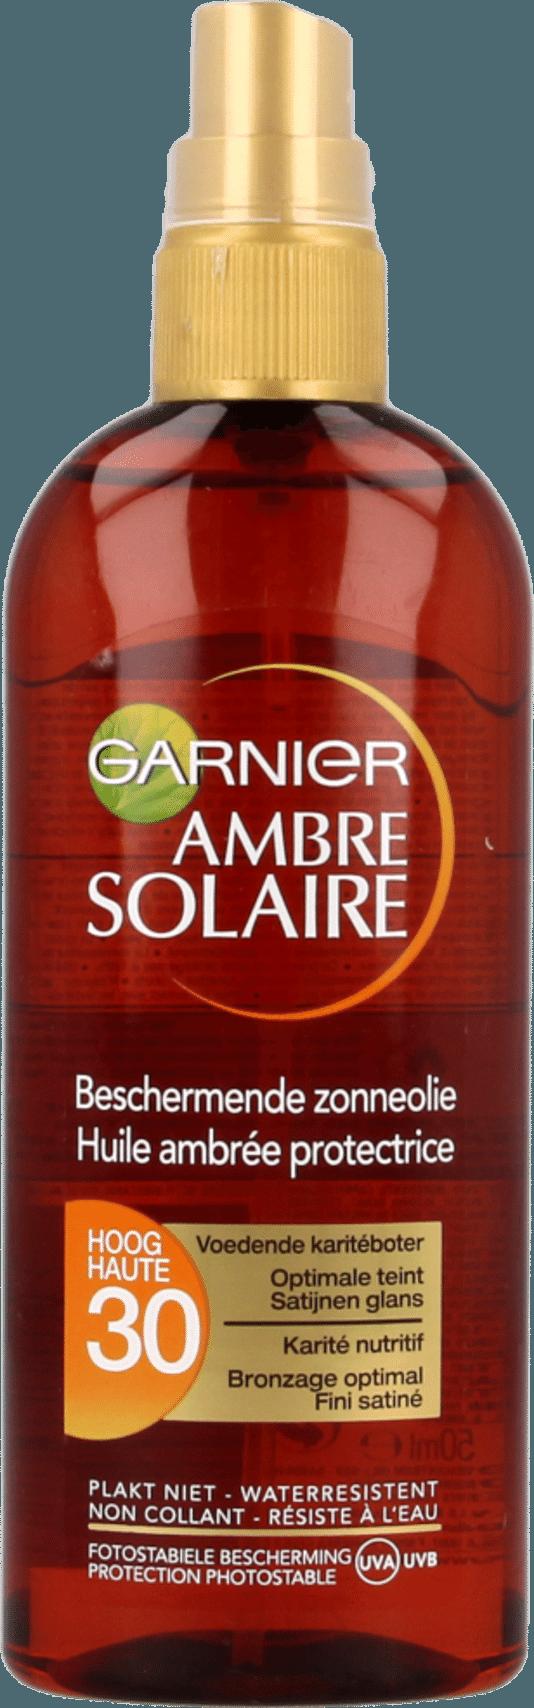 Ambre Solair van Garnier met karité boter komt als beste crème uit de test.